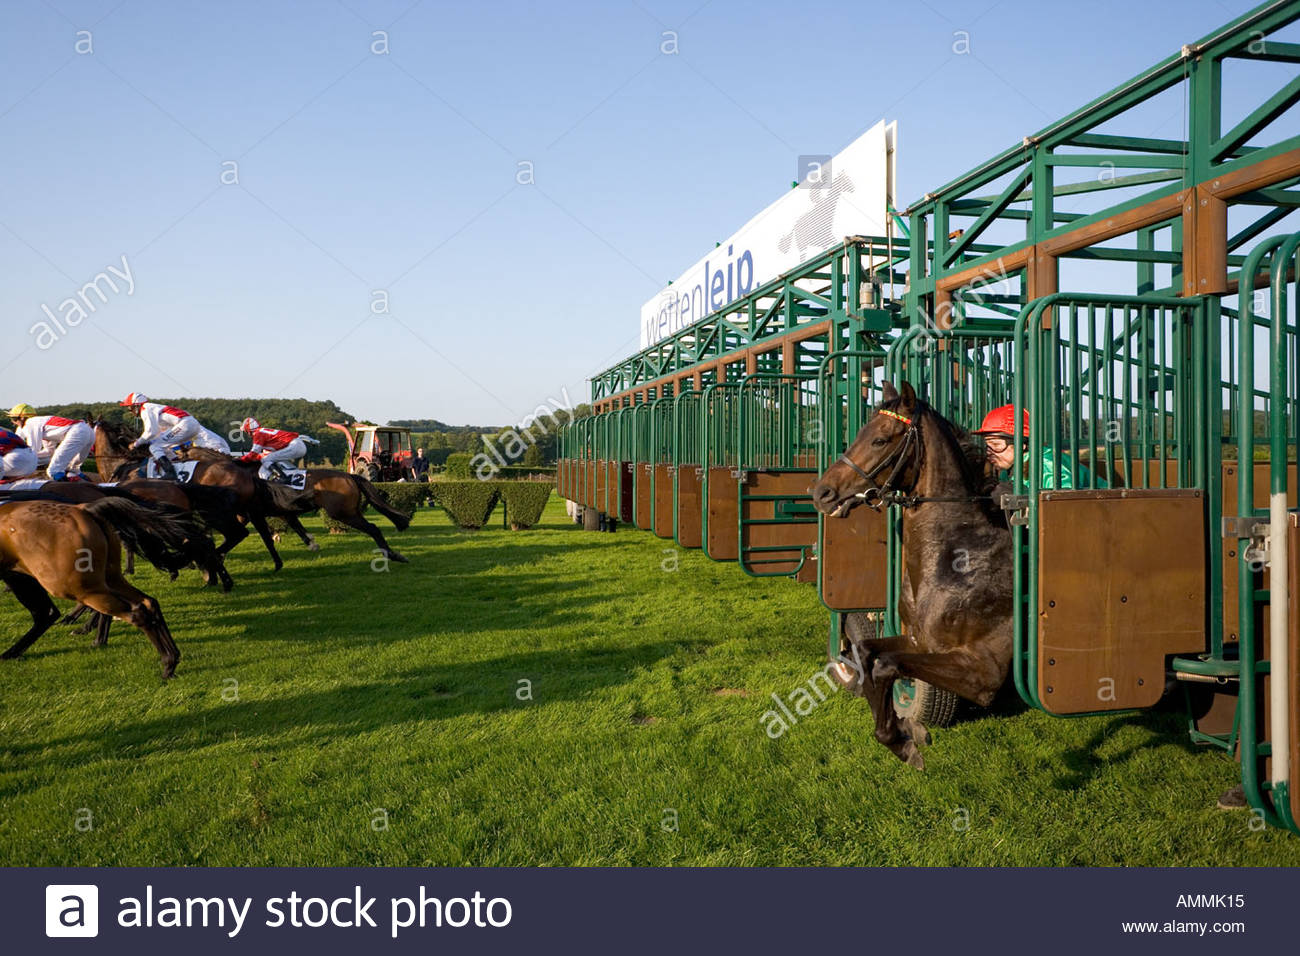 Horseracing Racecourse Racetrack Race Start Late Starter Box Machine Jockey Stable Colours Silk Gallop Speed Grass Turf